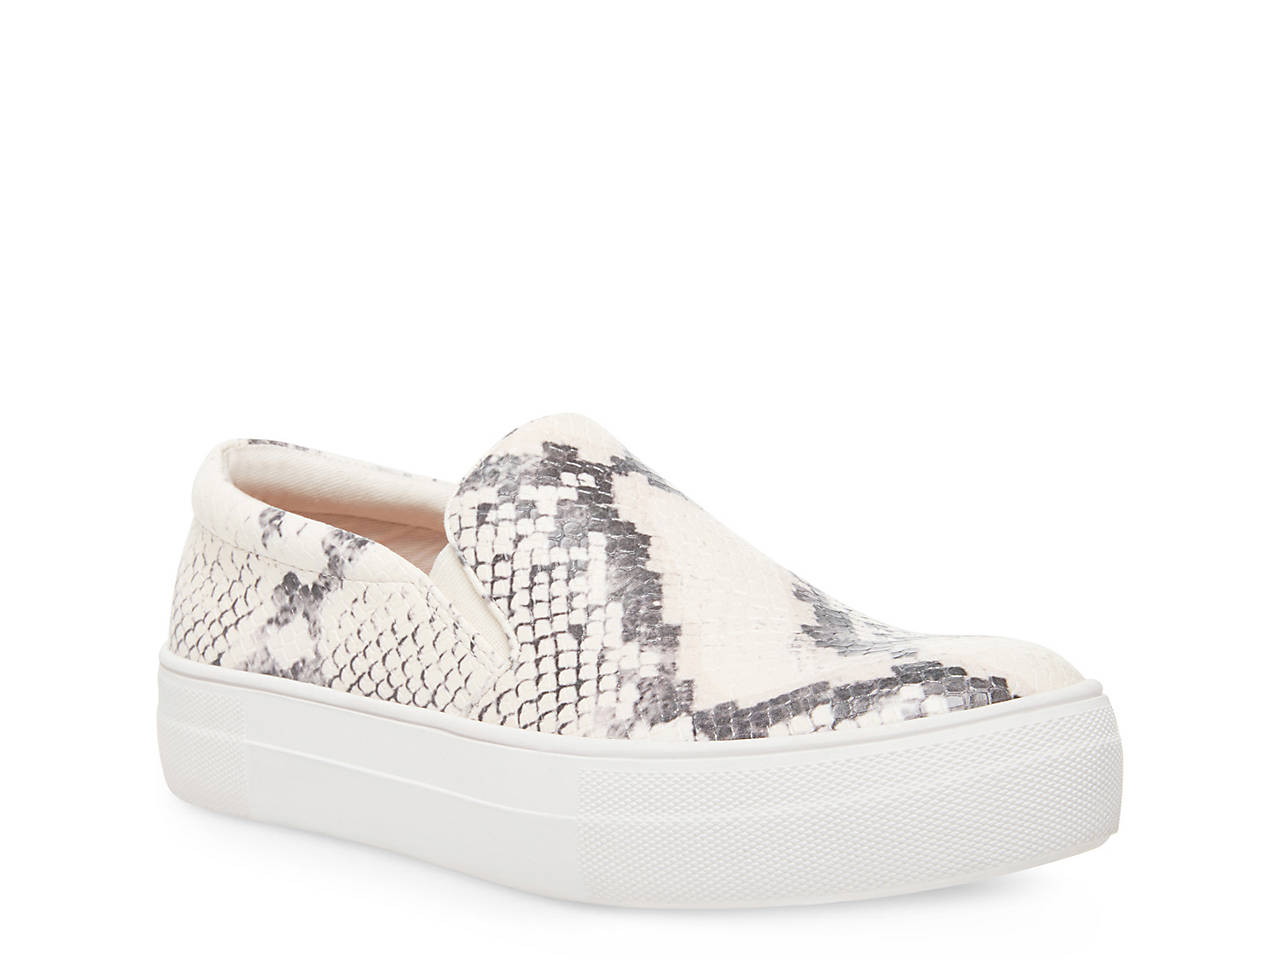 7fc283c764f Gills Platform Slip-On Sneaker